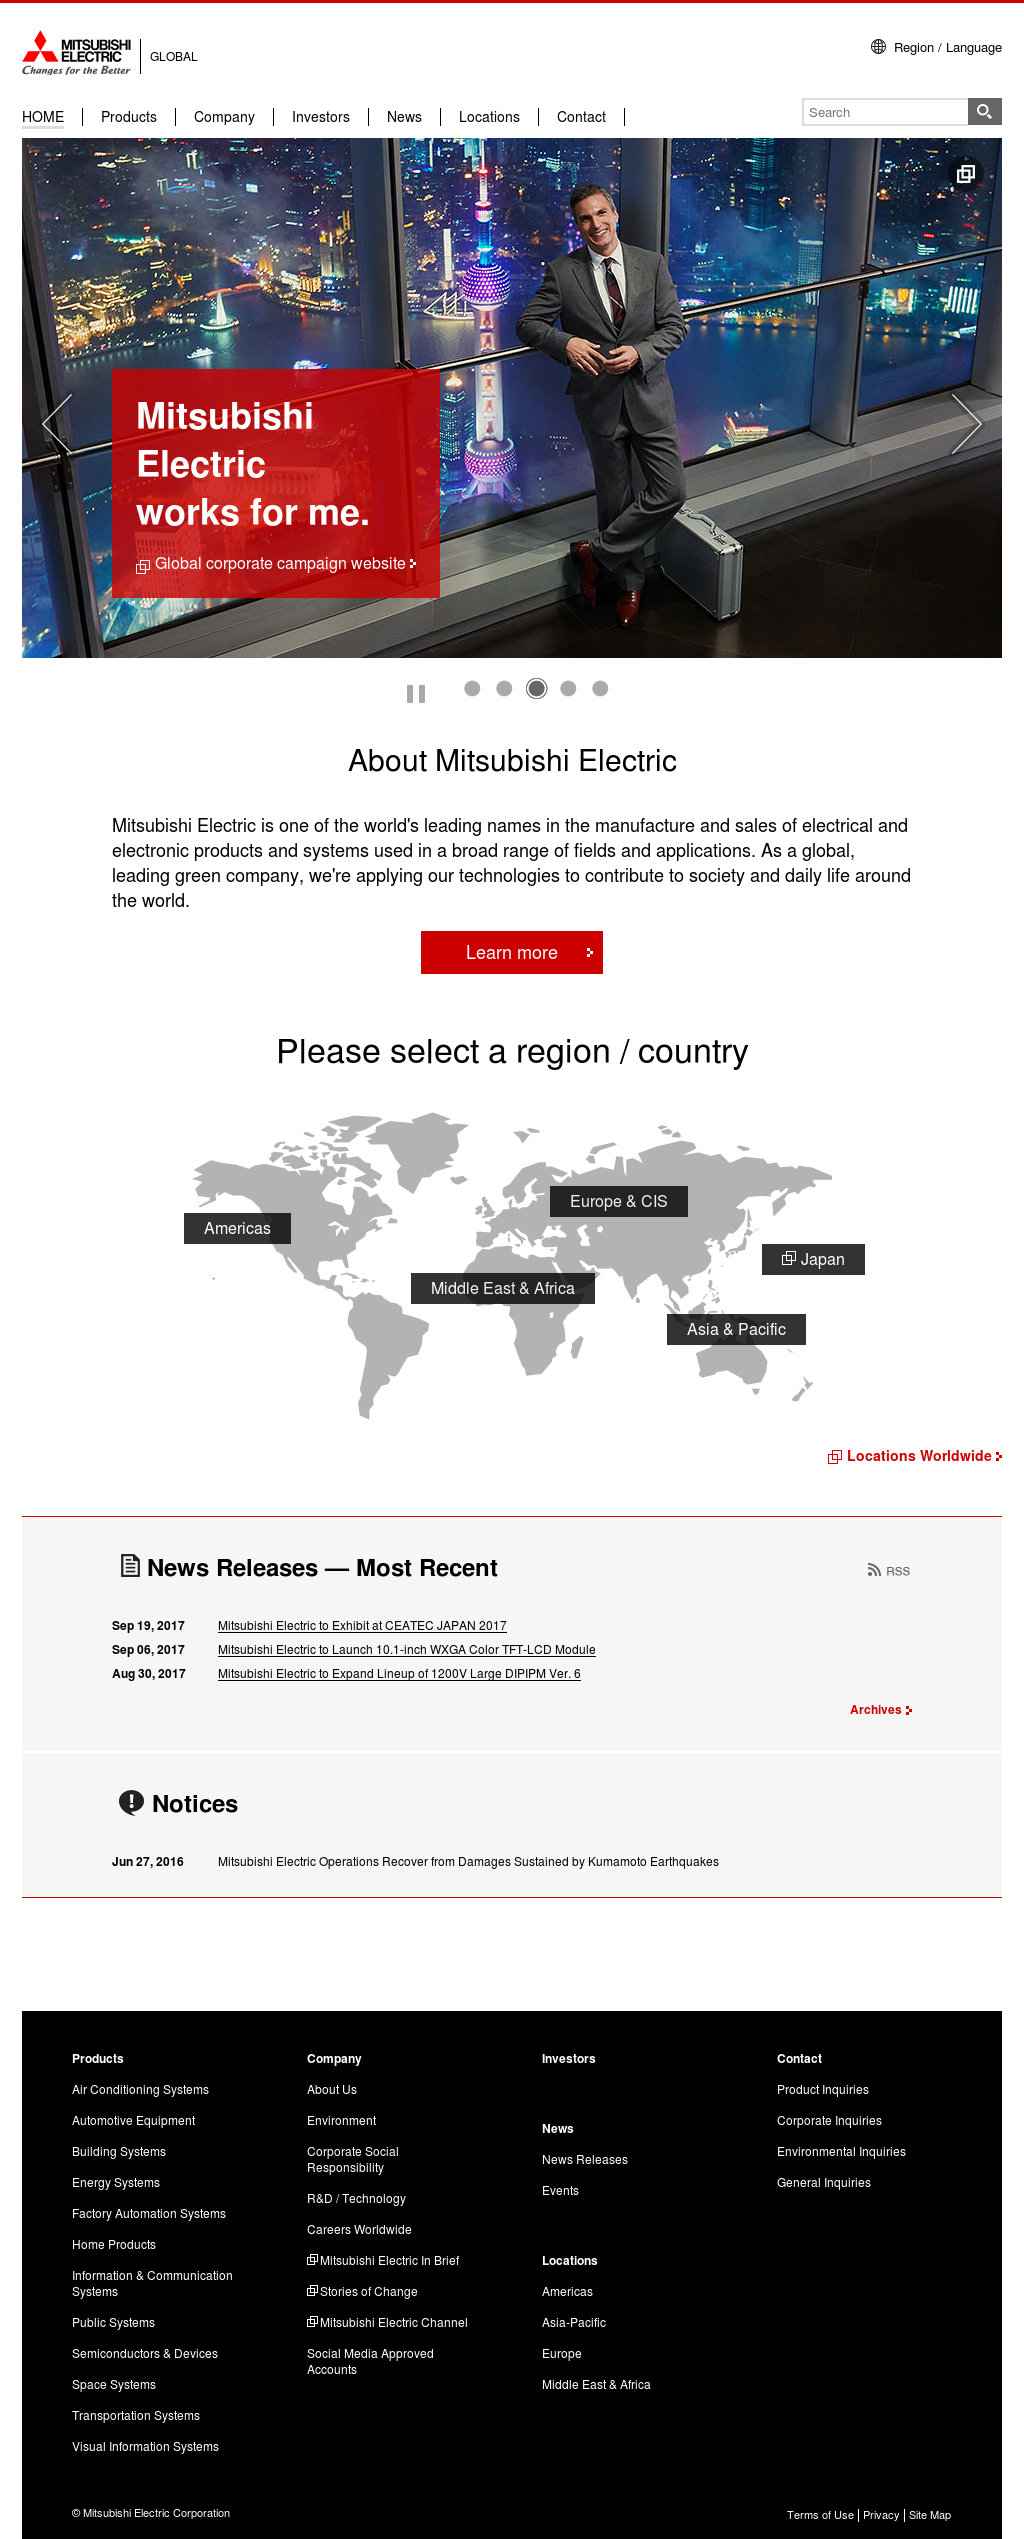 Owler Reports - Press Release: Mitsubishi Electric